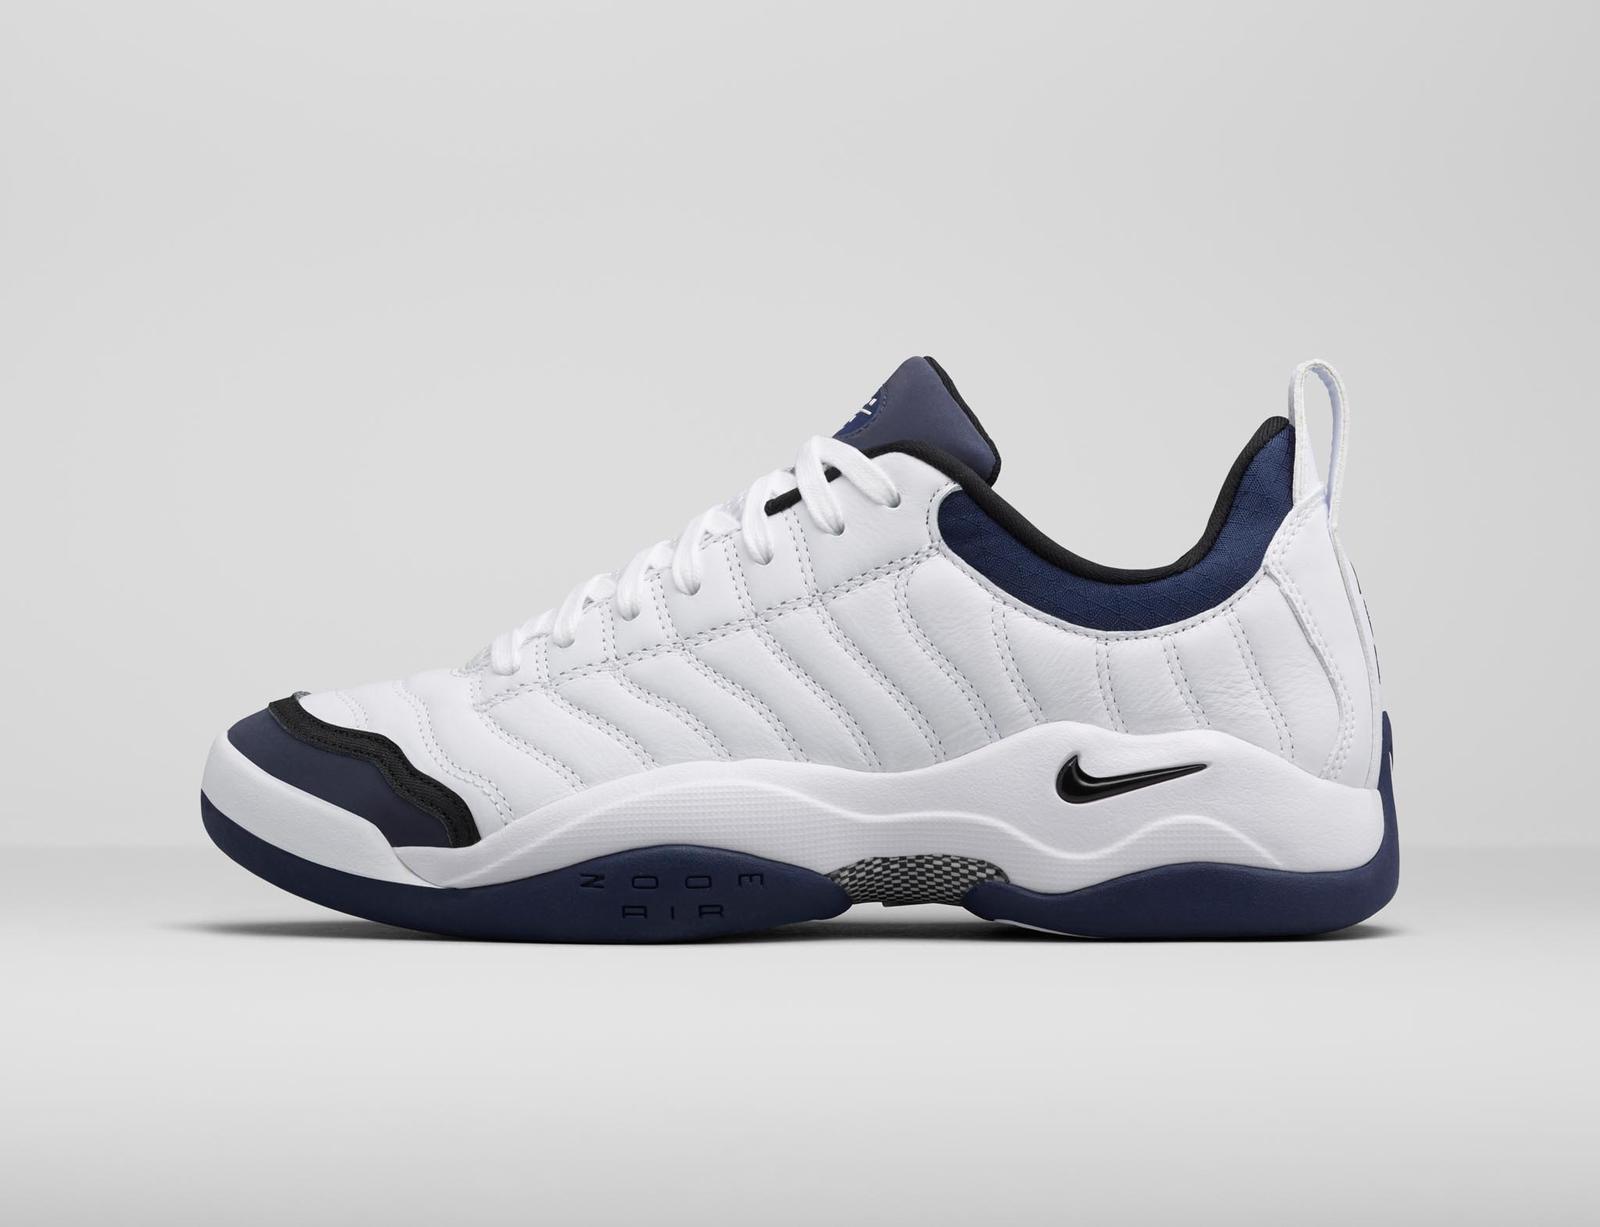 Nike Oscillate Tennis Shoes